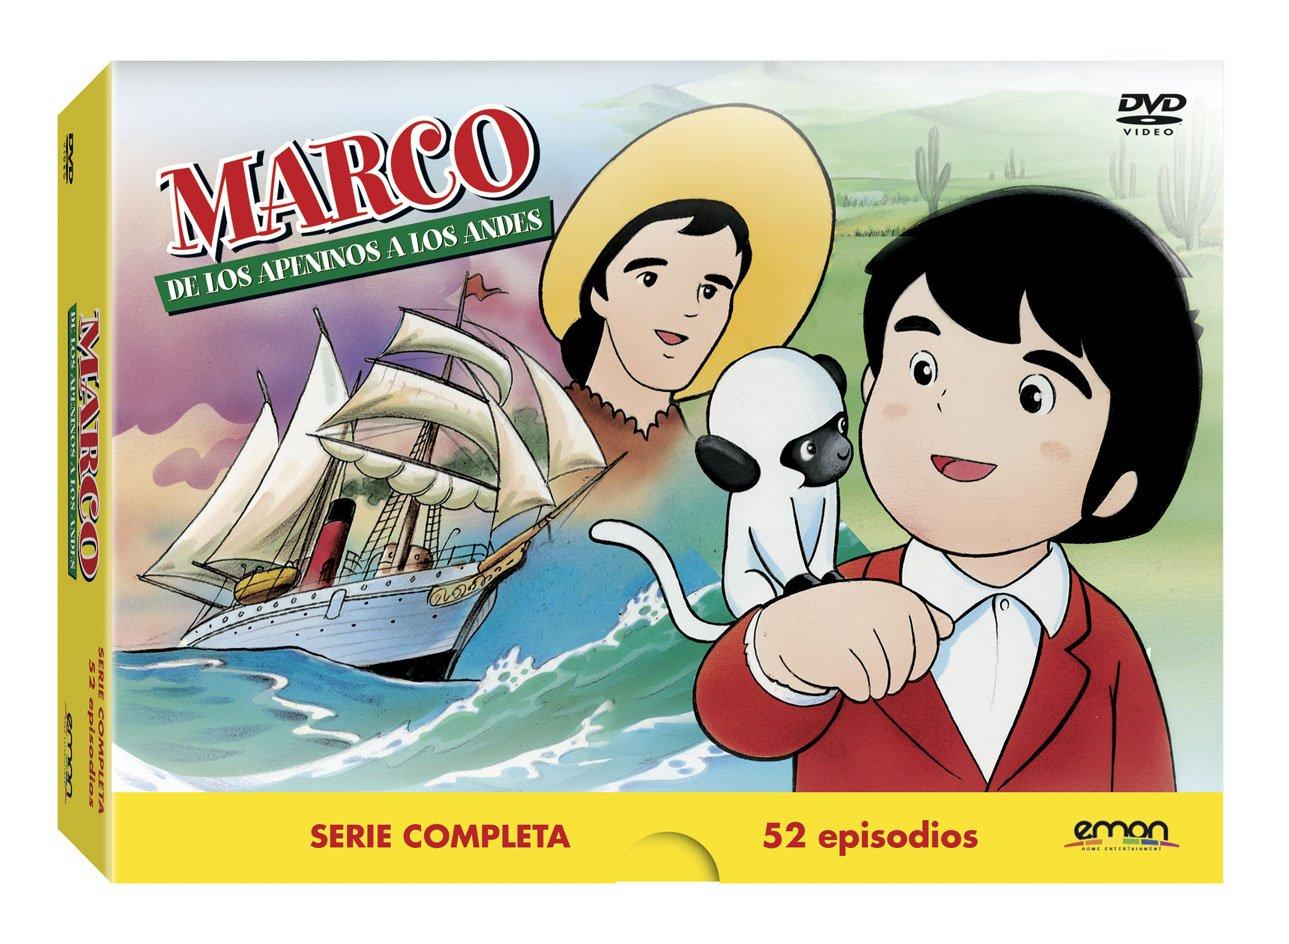 Marco - Serie Completa [DVD]: Amazon.es: Isao Takahata: Cine y Series TV